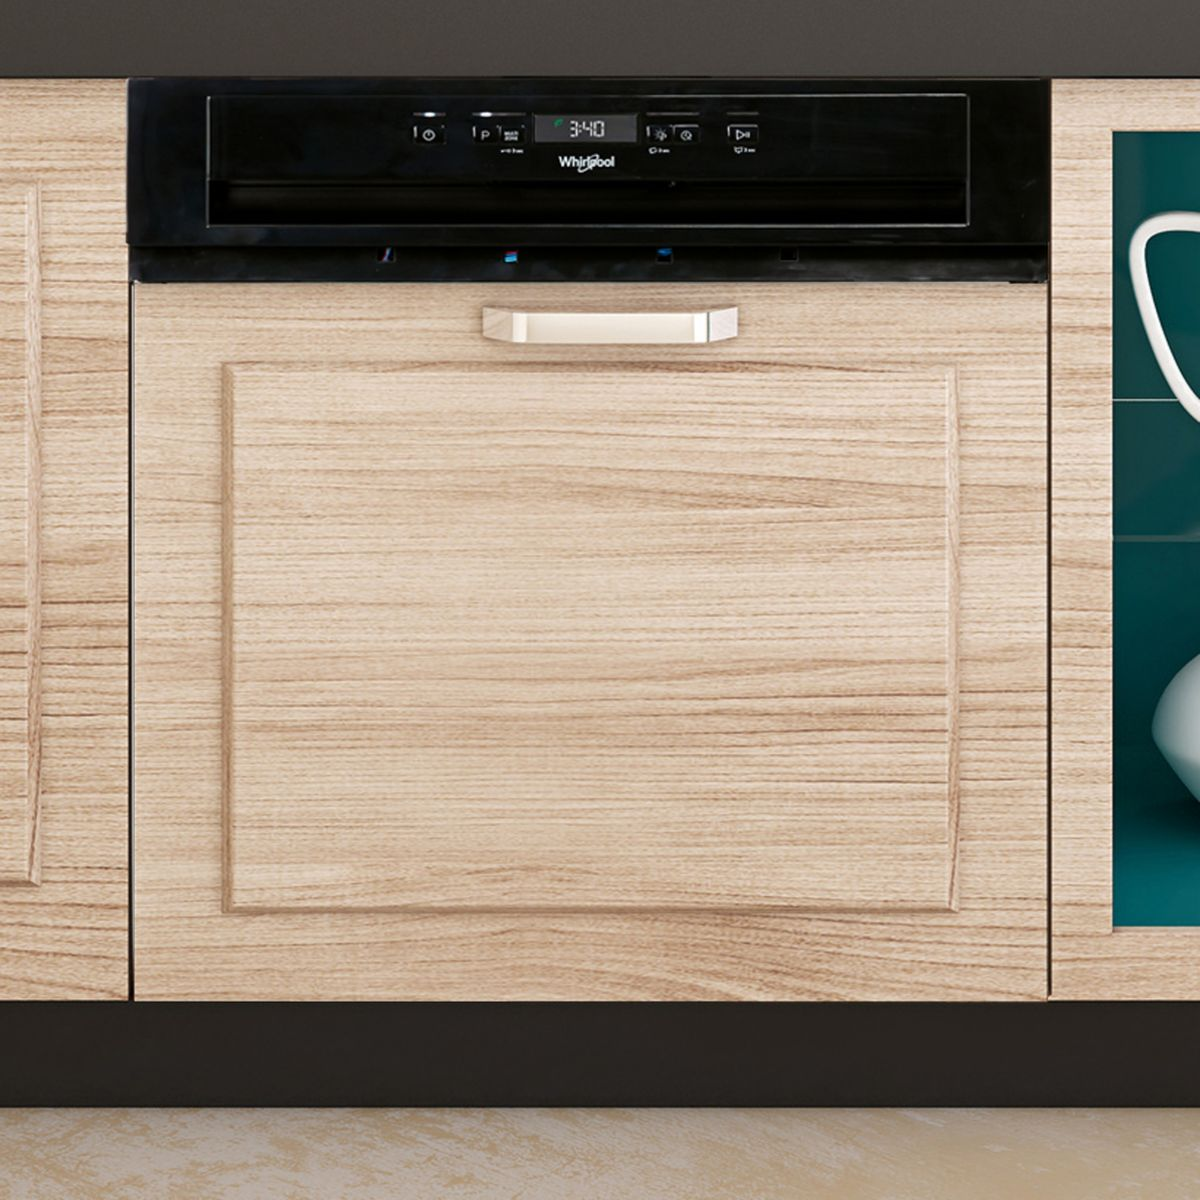 Lave vaisselle encastrable WHIRLPOOL WKBO3T123PFB